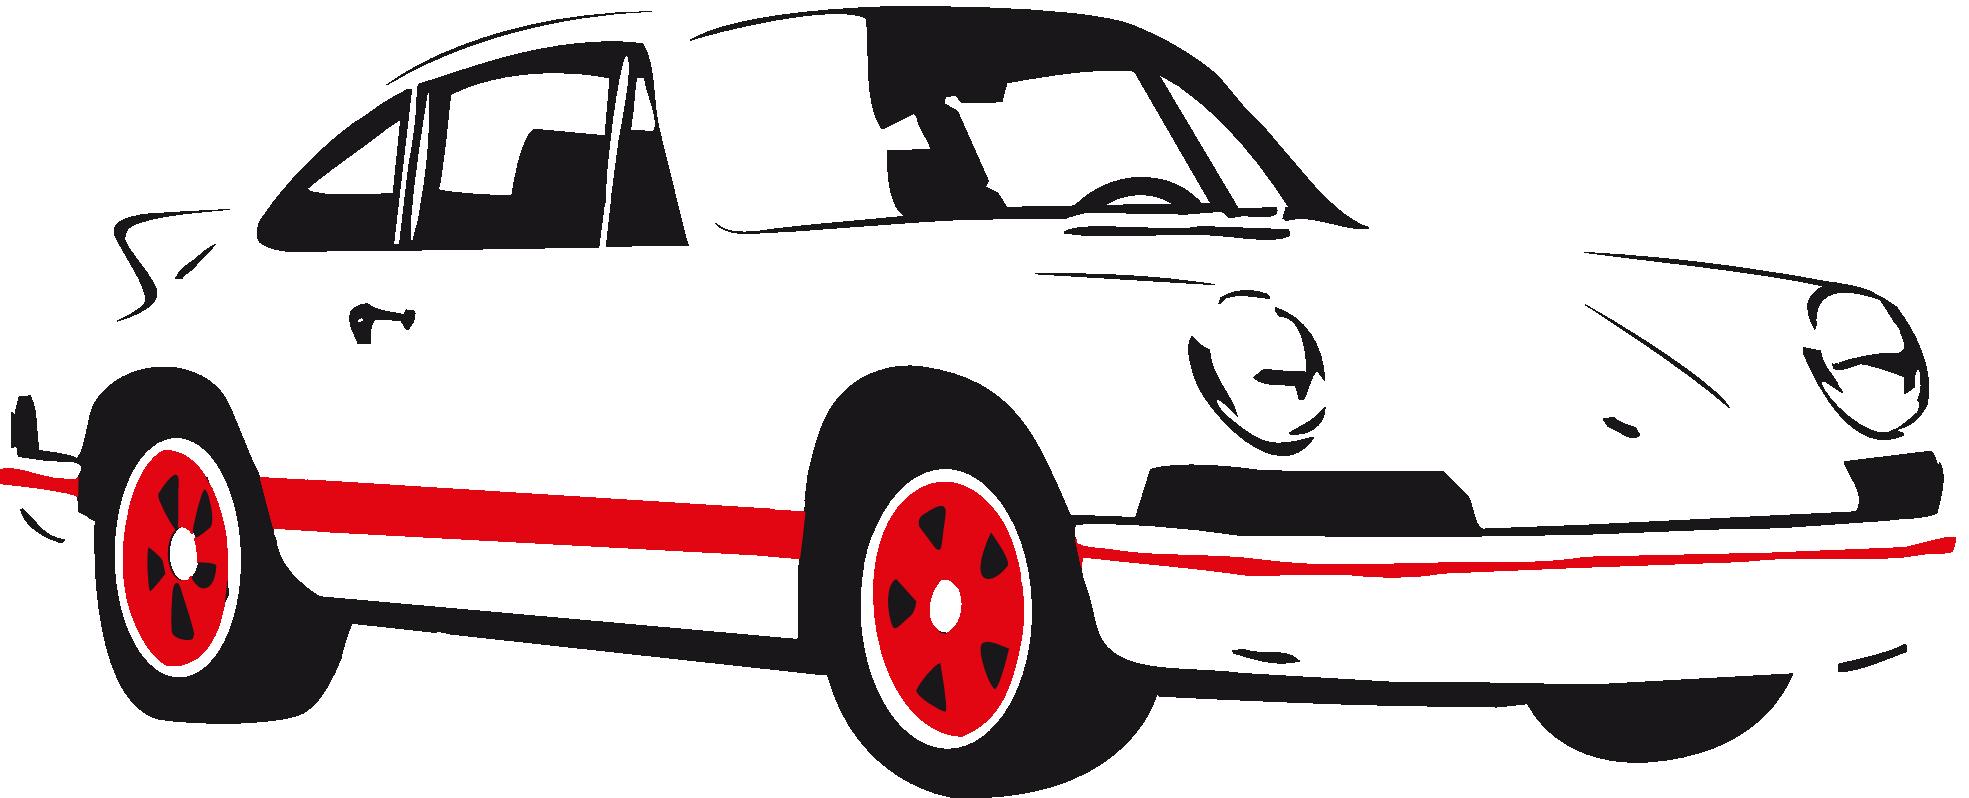 1969x798 Classic Car Clipart Cool Car